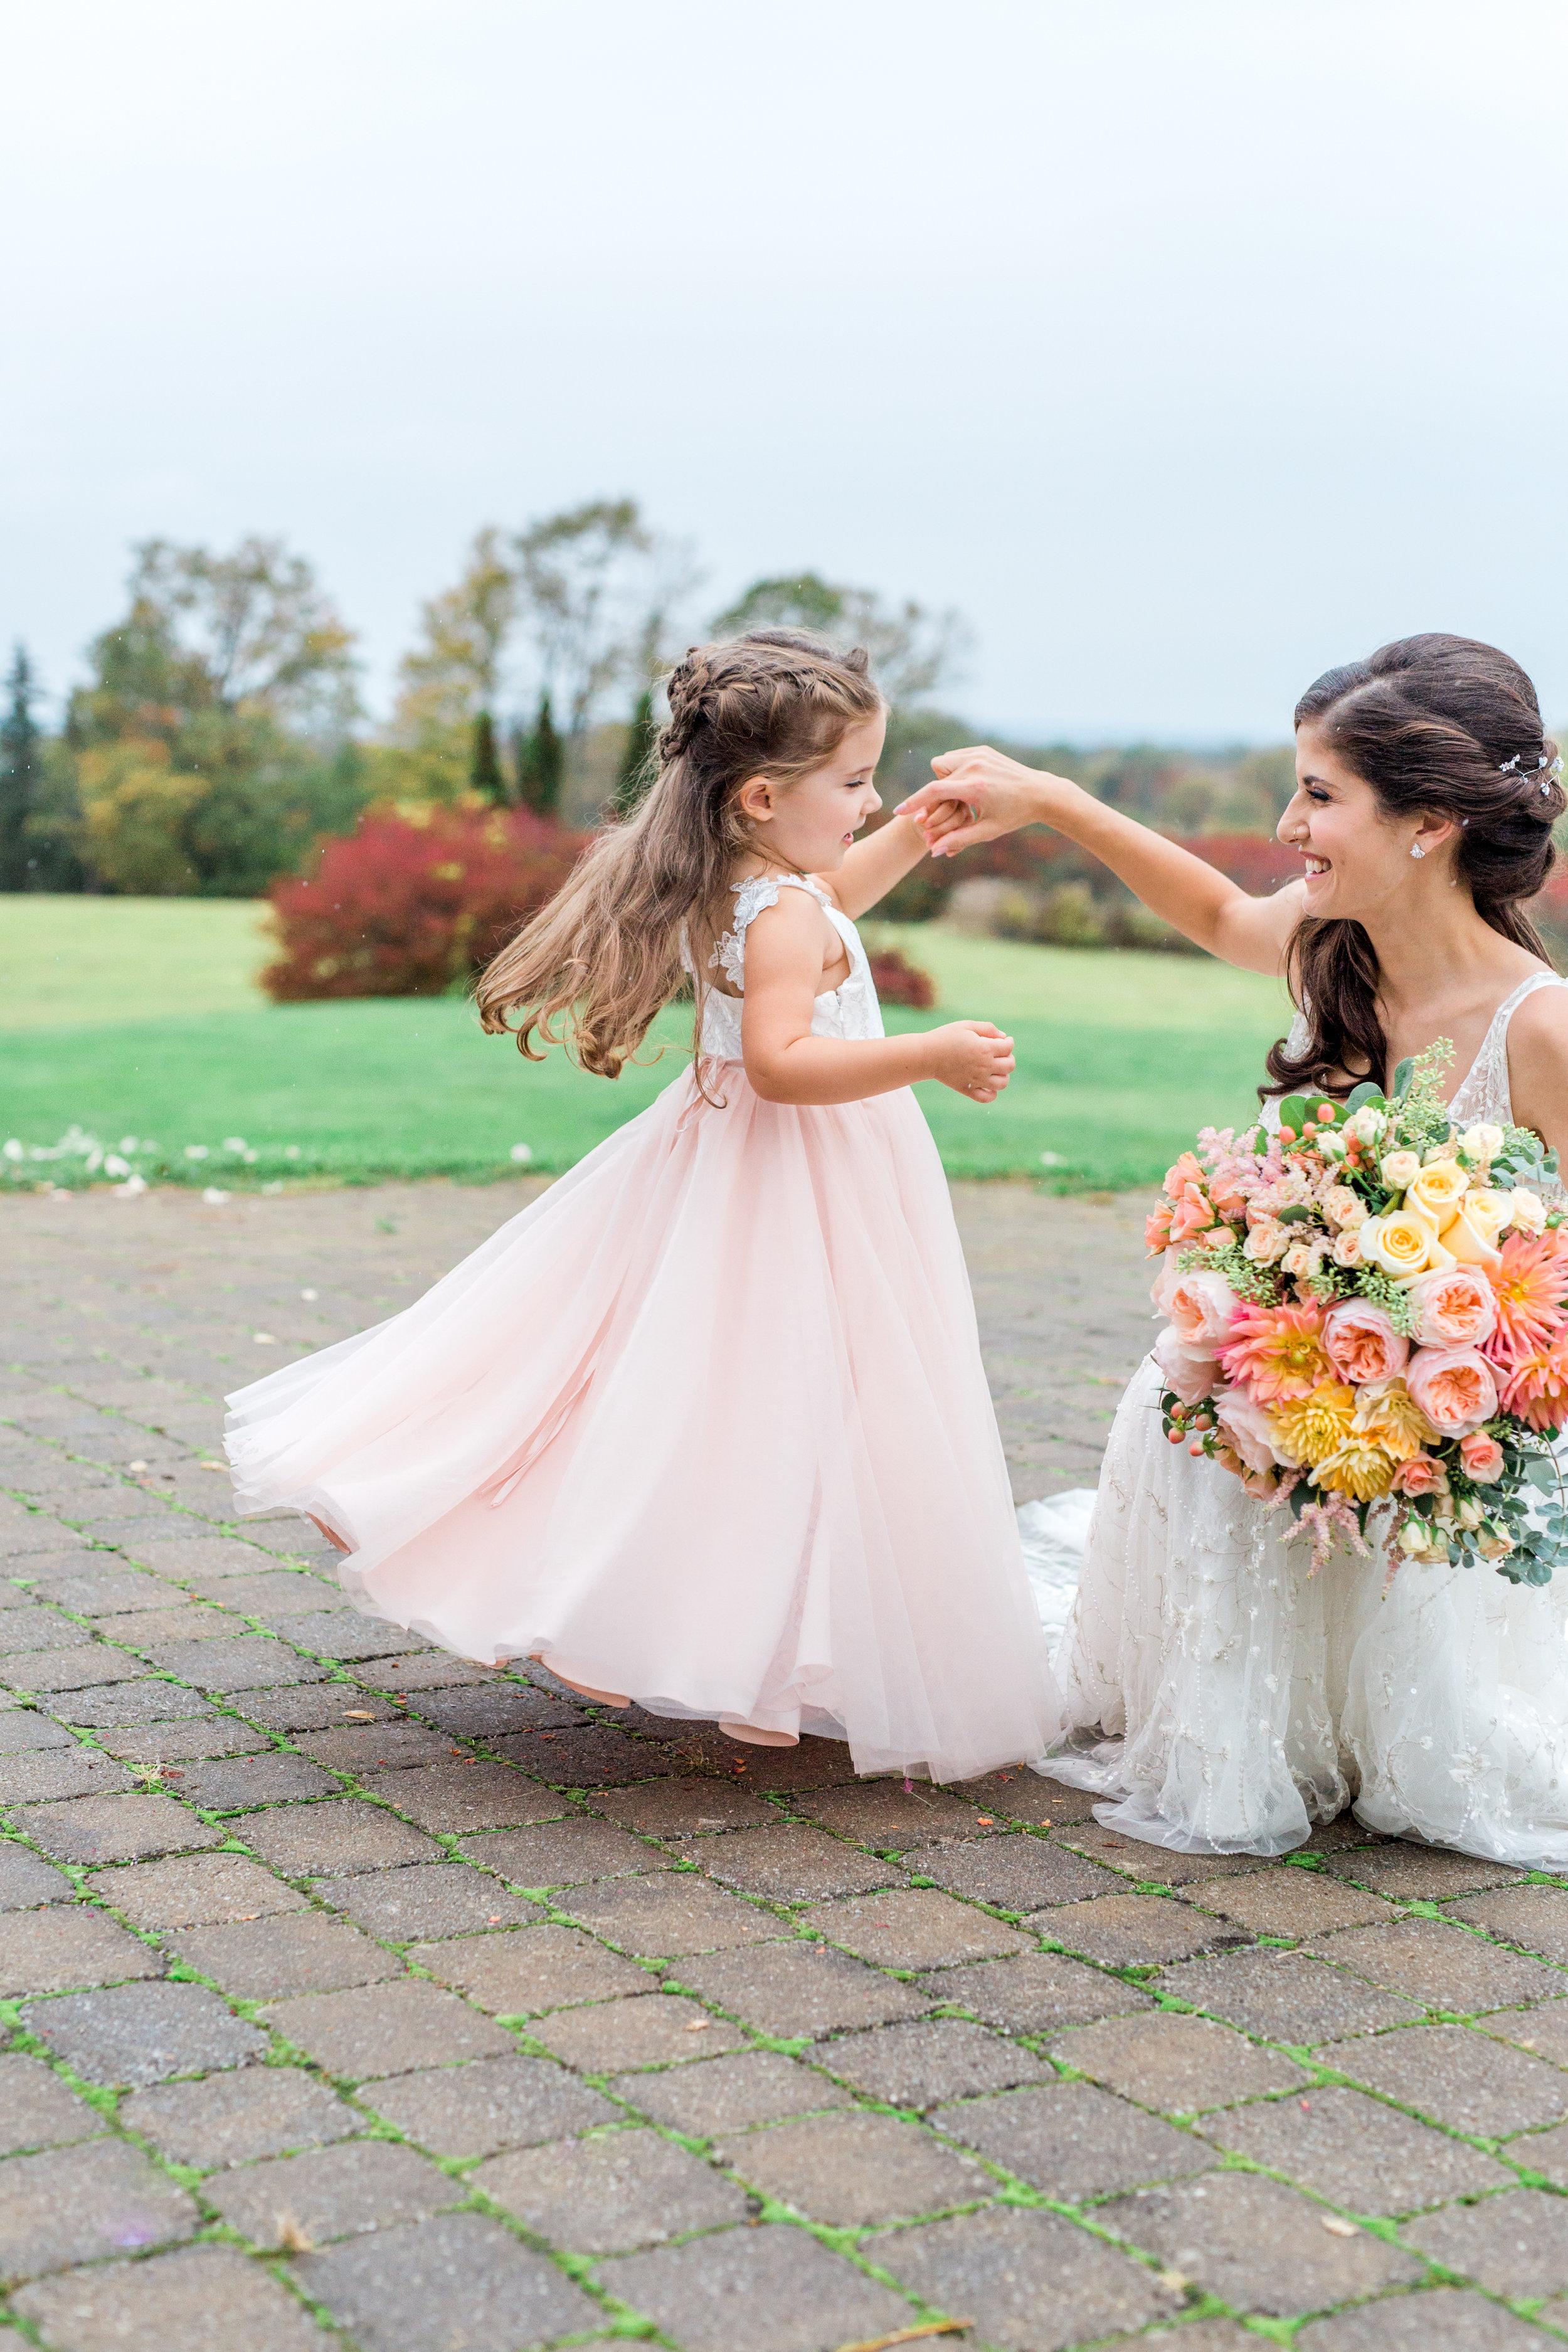 Amir-Golbazi-Danielle-Giroux-Photography_Toronto-Wedding_Cedarwood_Rachel-Paul_433.jpg